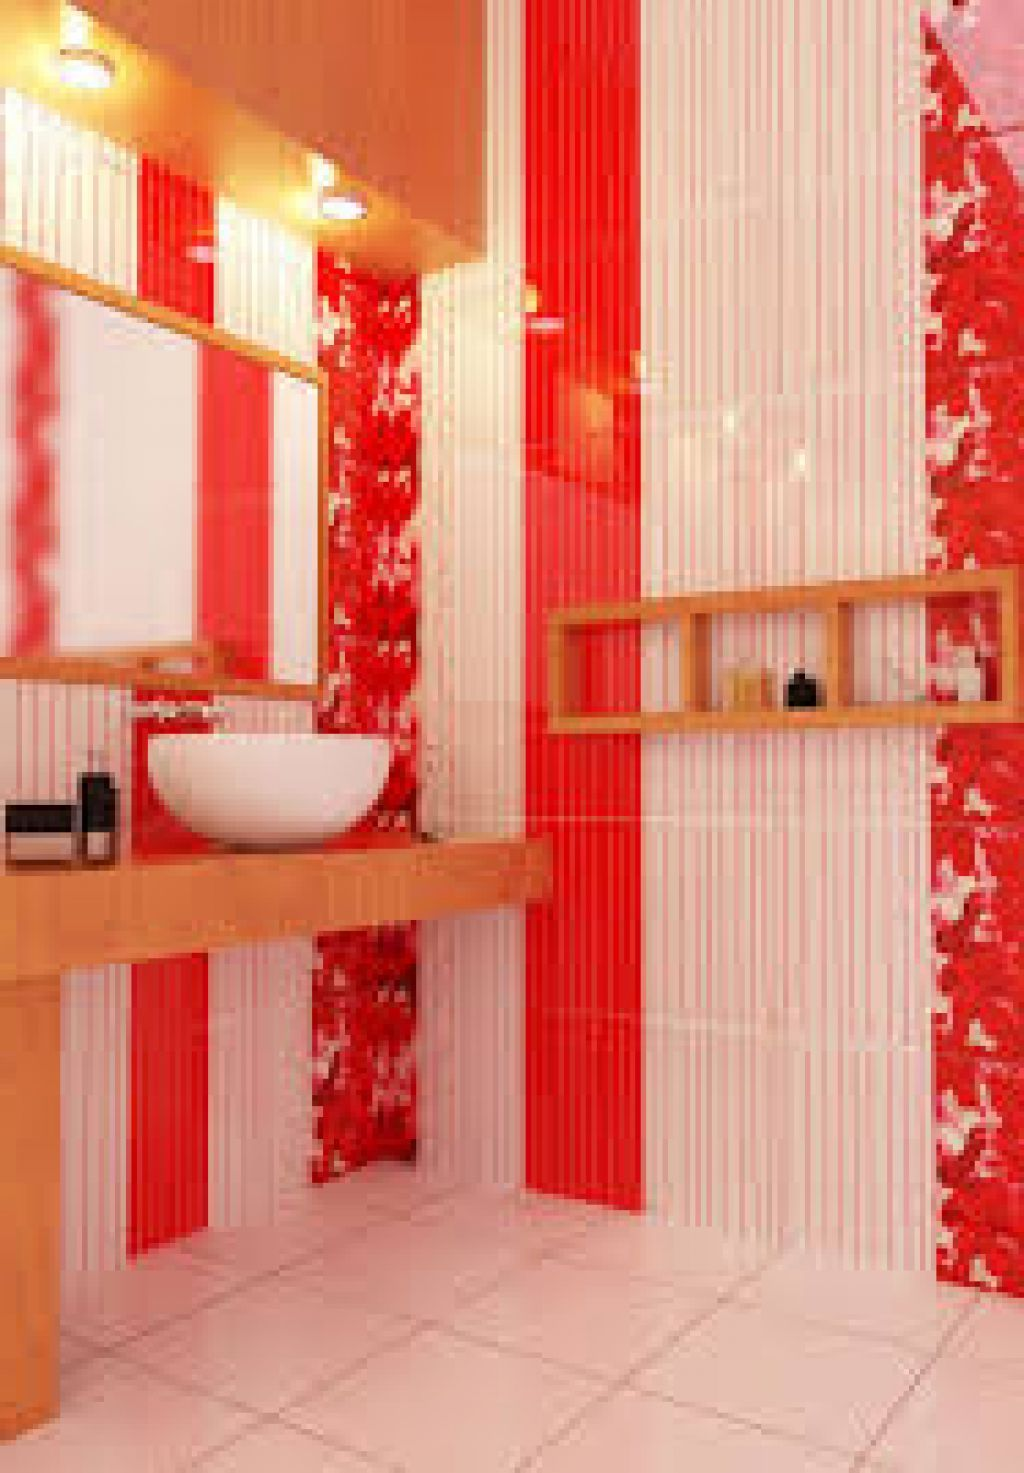 Bathroom Colorful Small Bathroom Ideas In Minimalist Home With Simple Arrangement Colorful Small Bathroom